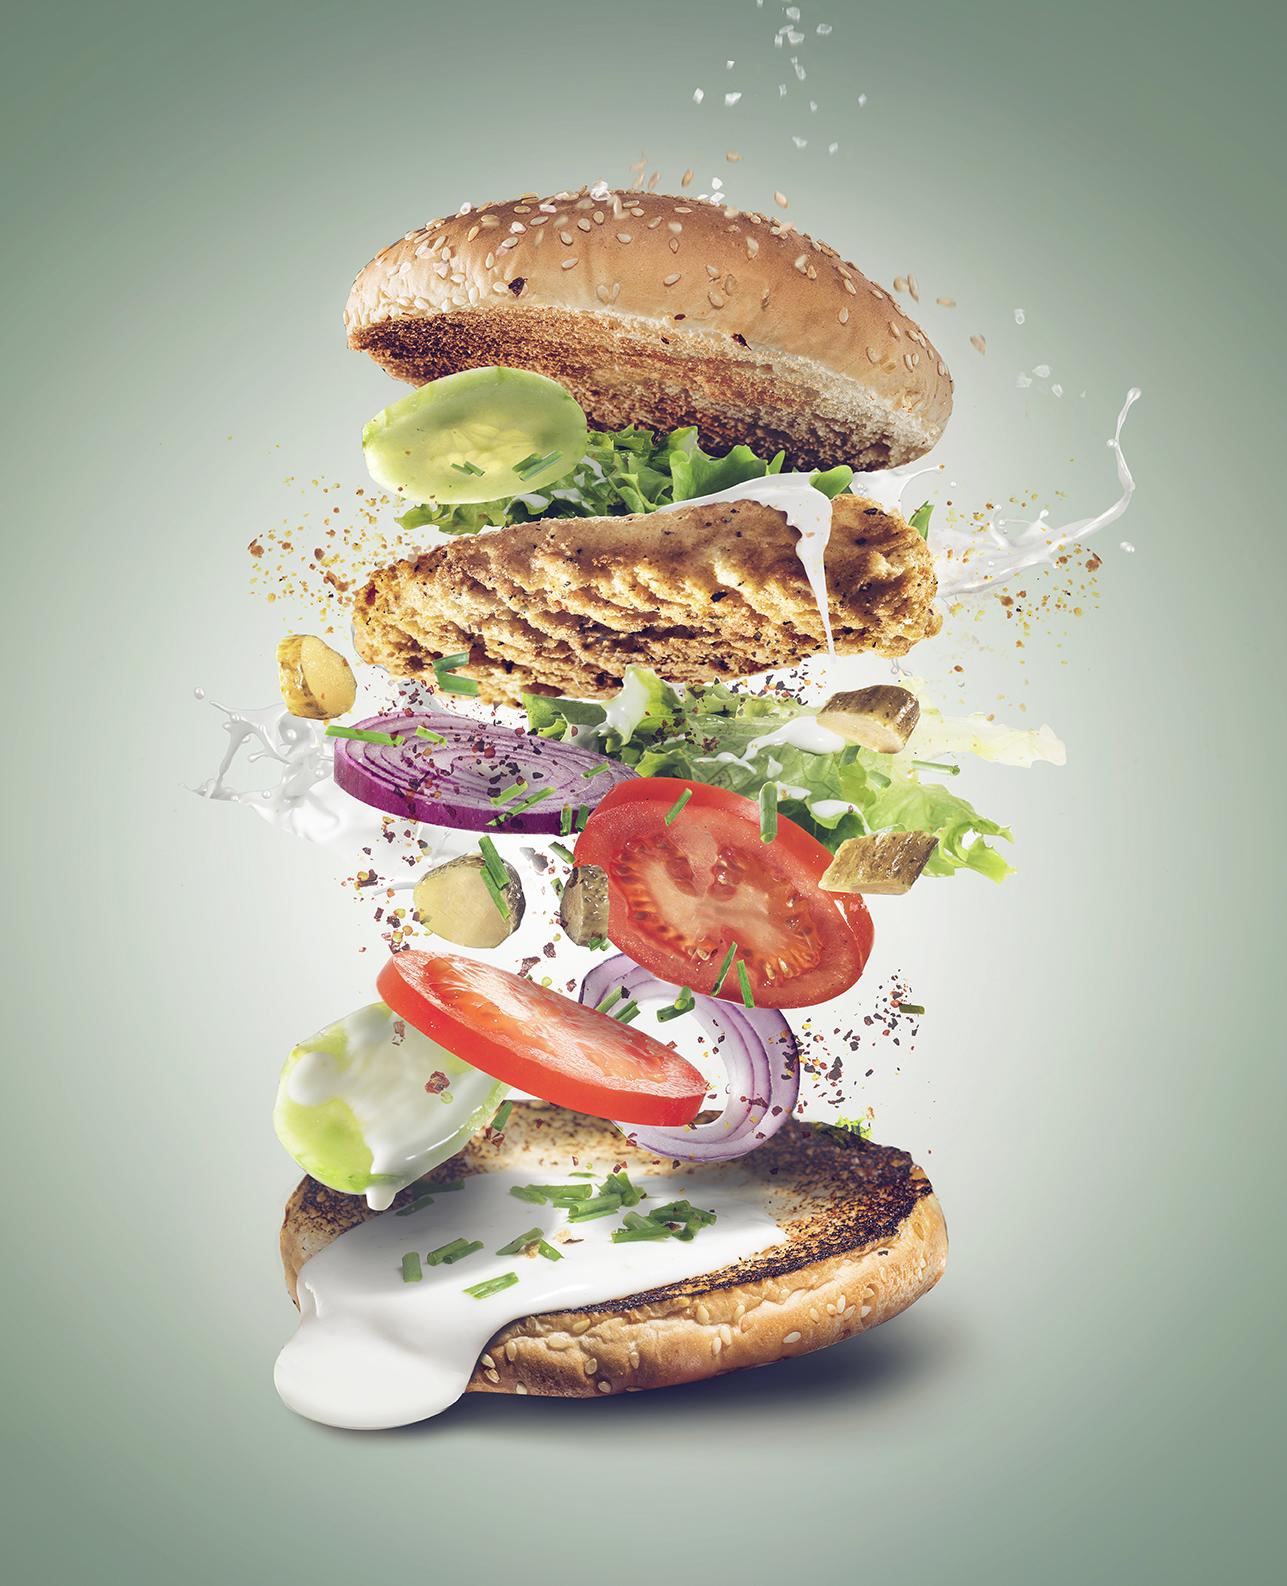 chickenburger_srgb.jpg